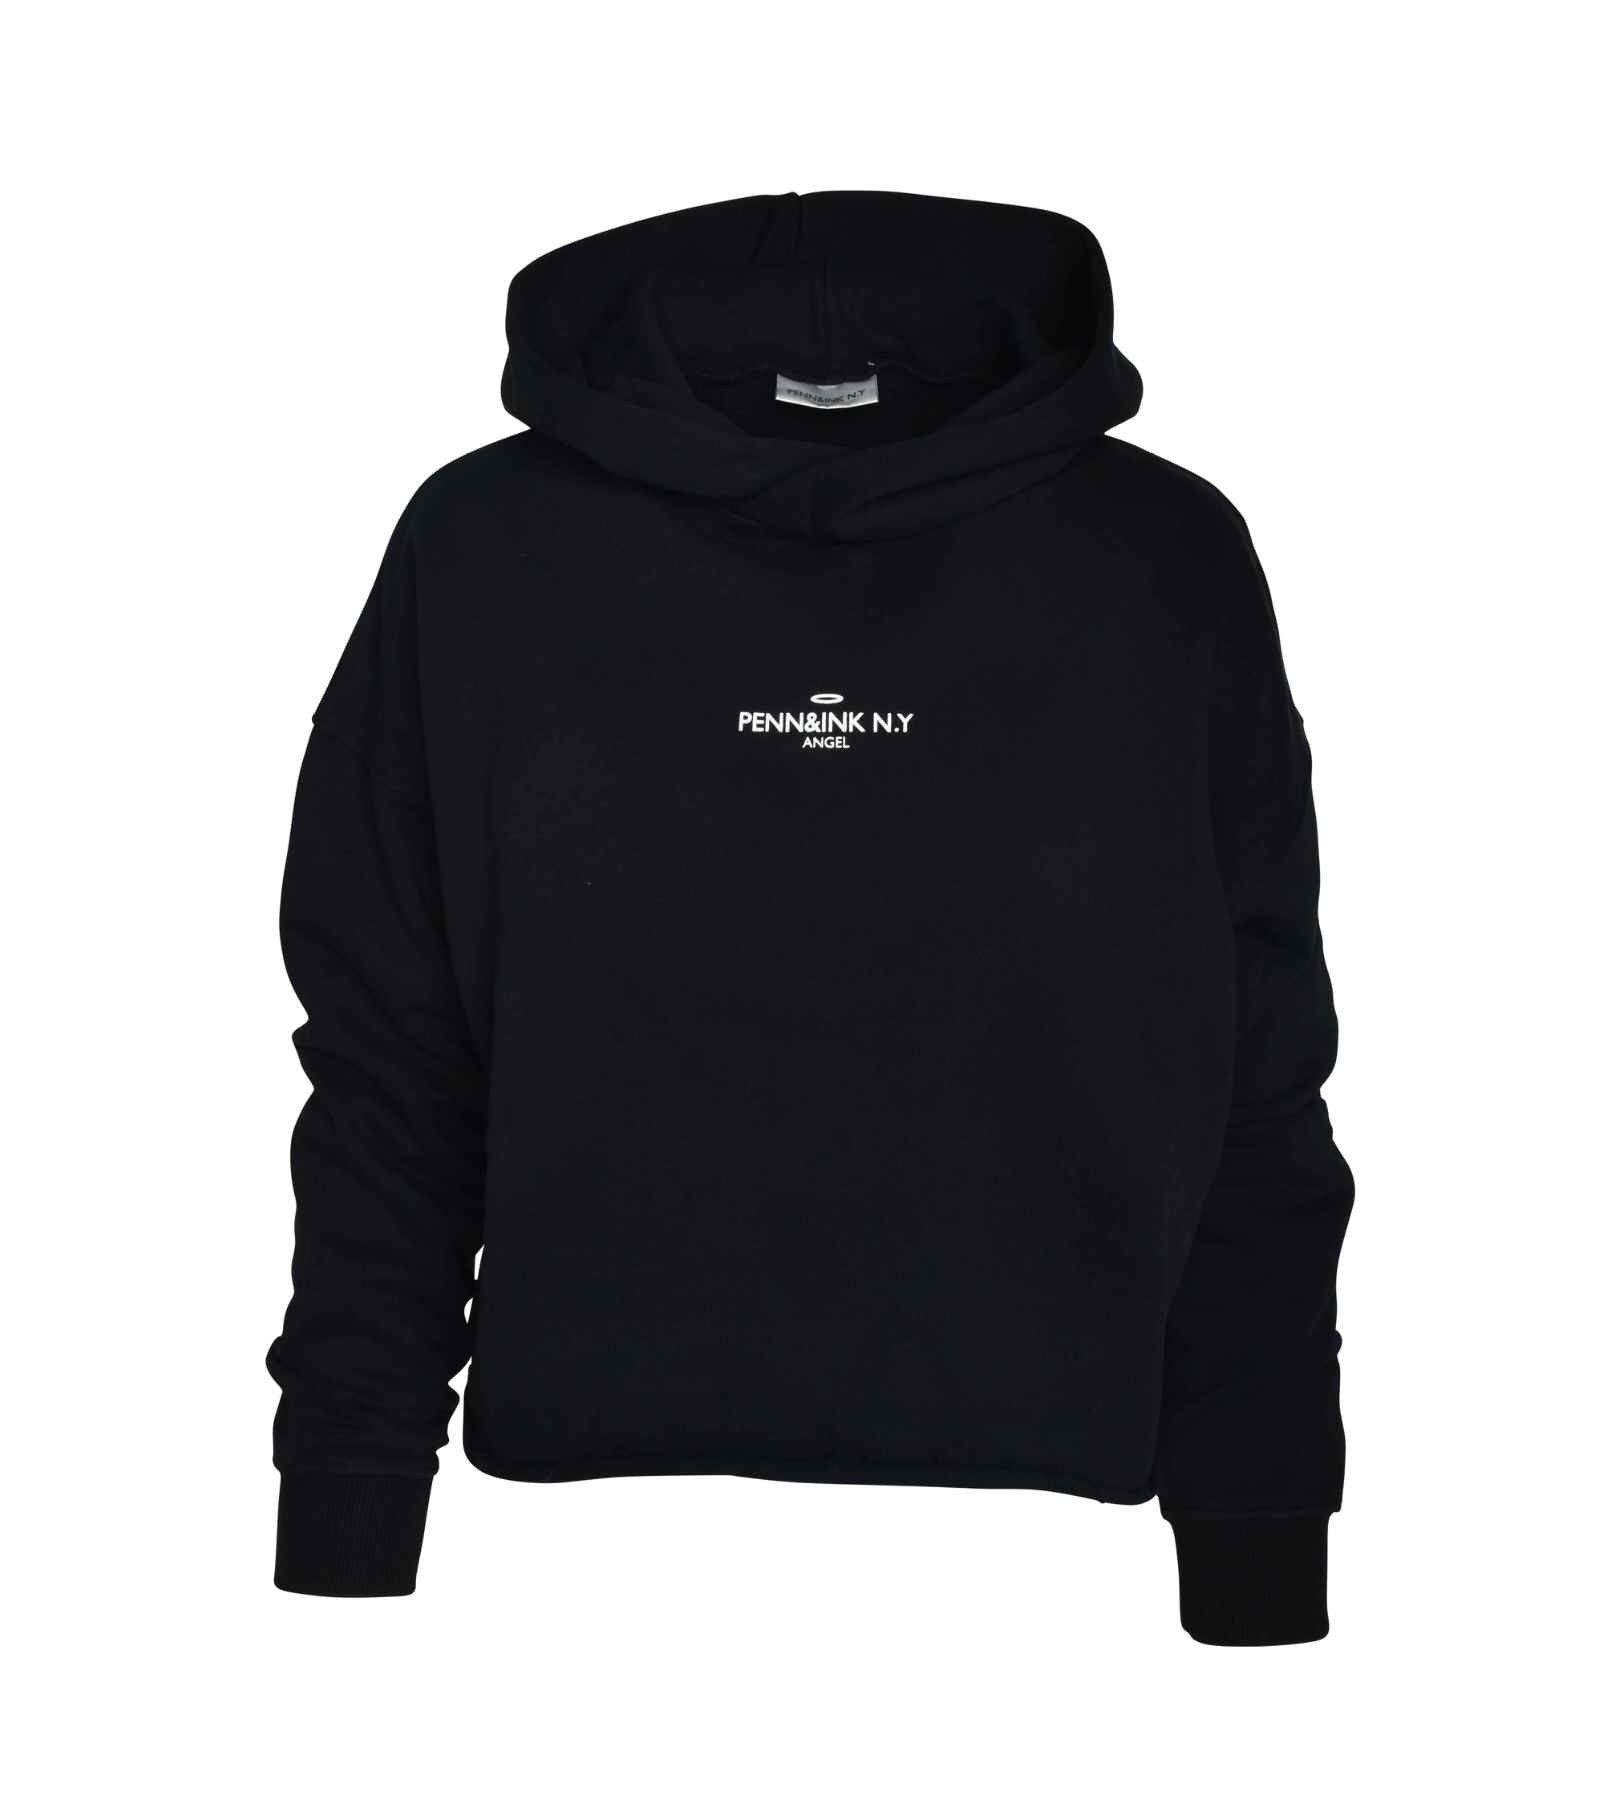 PENN&INK N.Y - Damen Sweater - Black/White